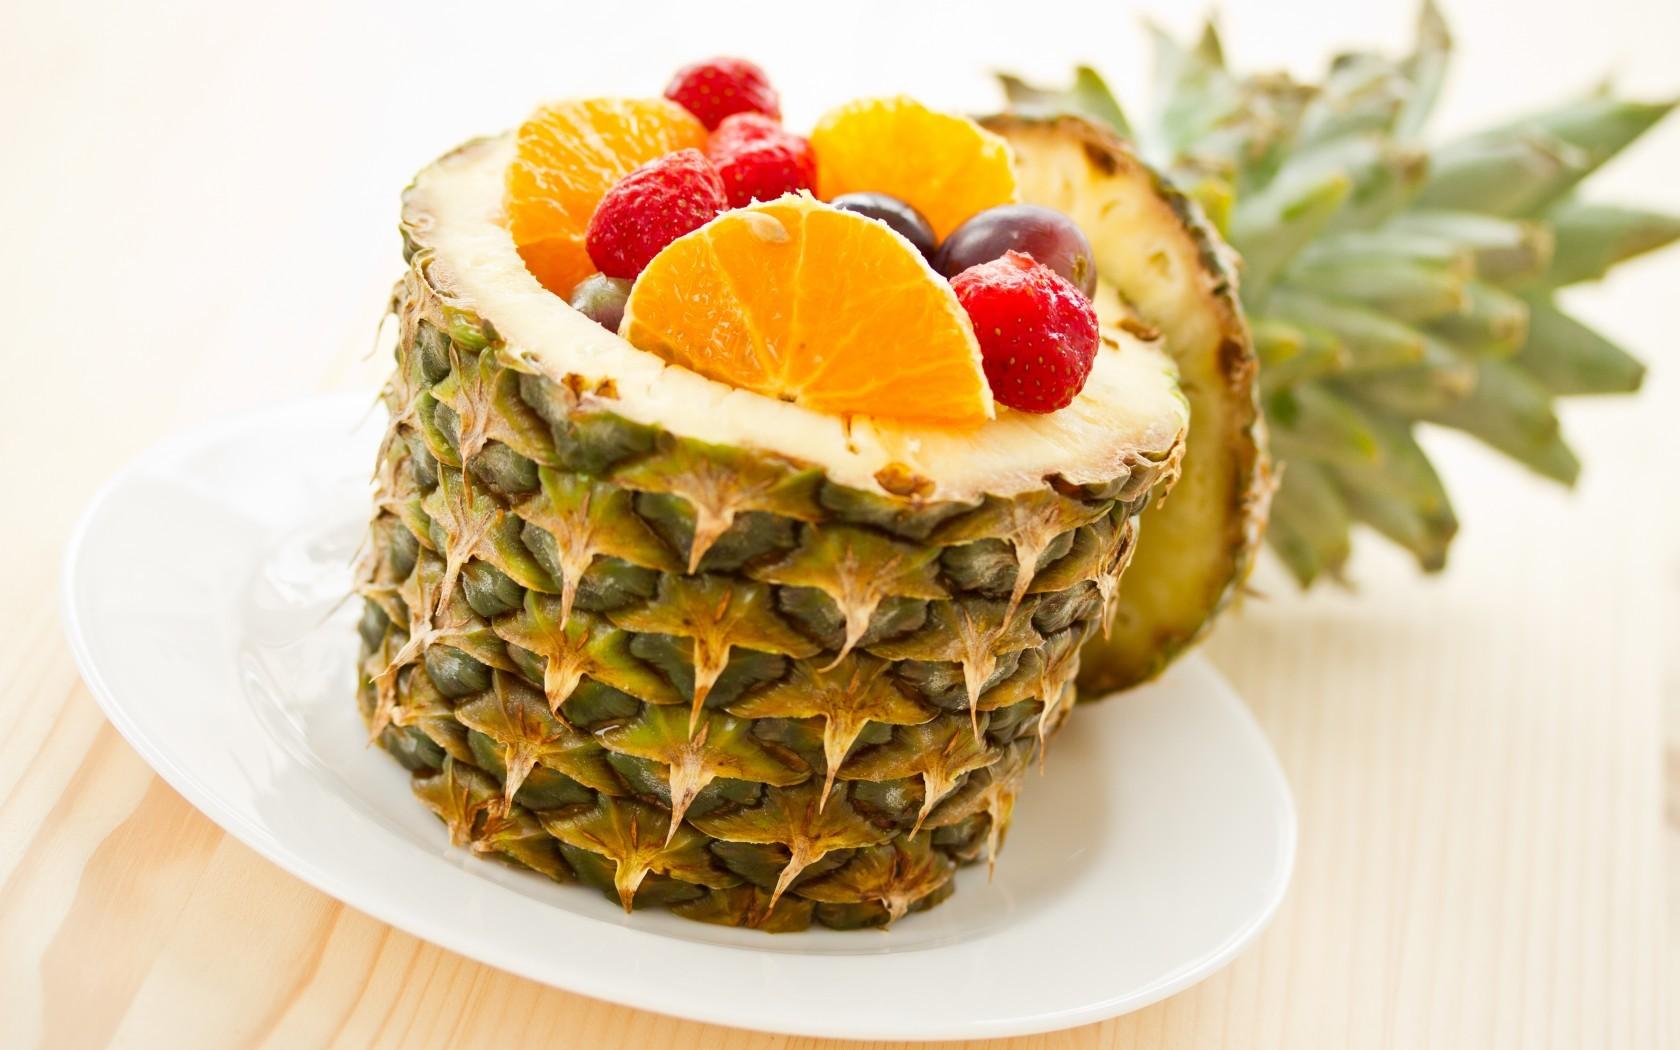 Best Wallpaper Mac Pineapple - pineapple-1680x1050-orange-mango-strawberry-grape-811  Gallery_23387.jpg